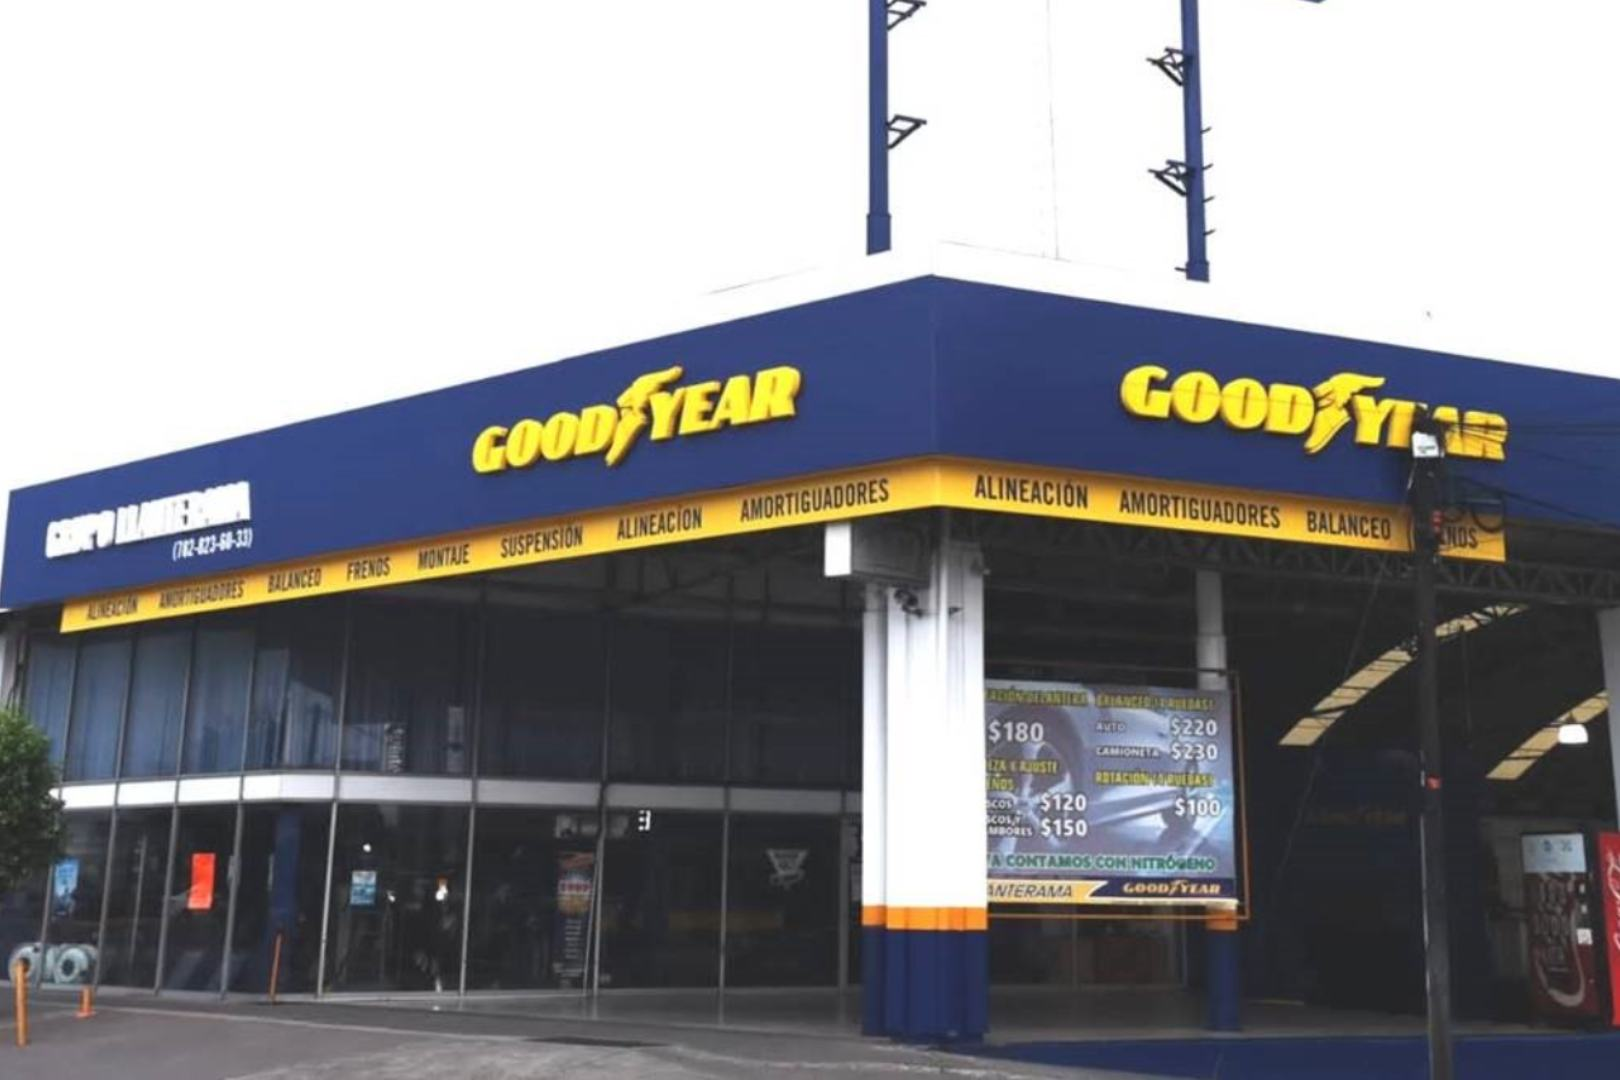 Goodyear, Llanteras, Andellac, Neumáticos,